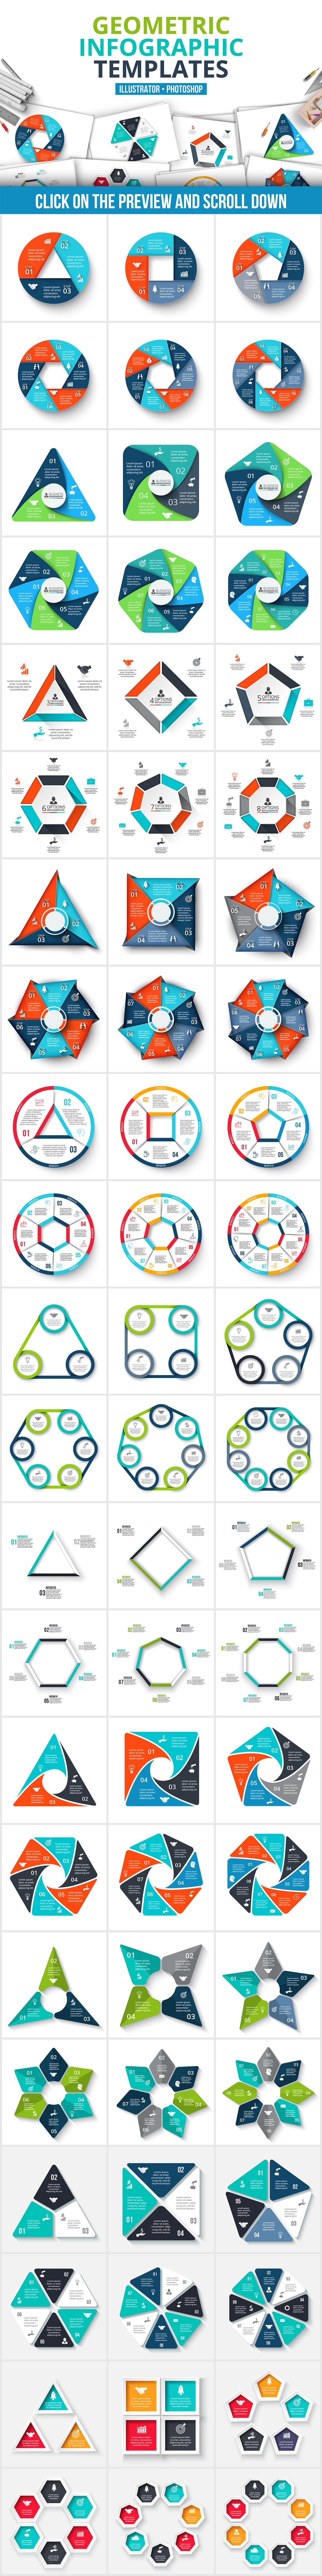 Geometric infographic templates example image 2